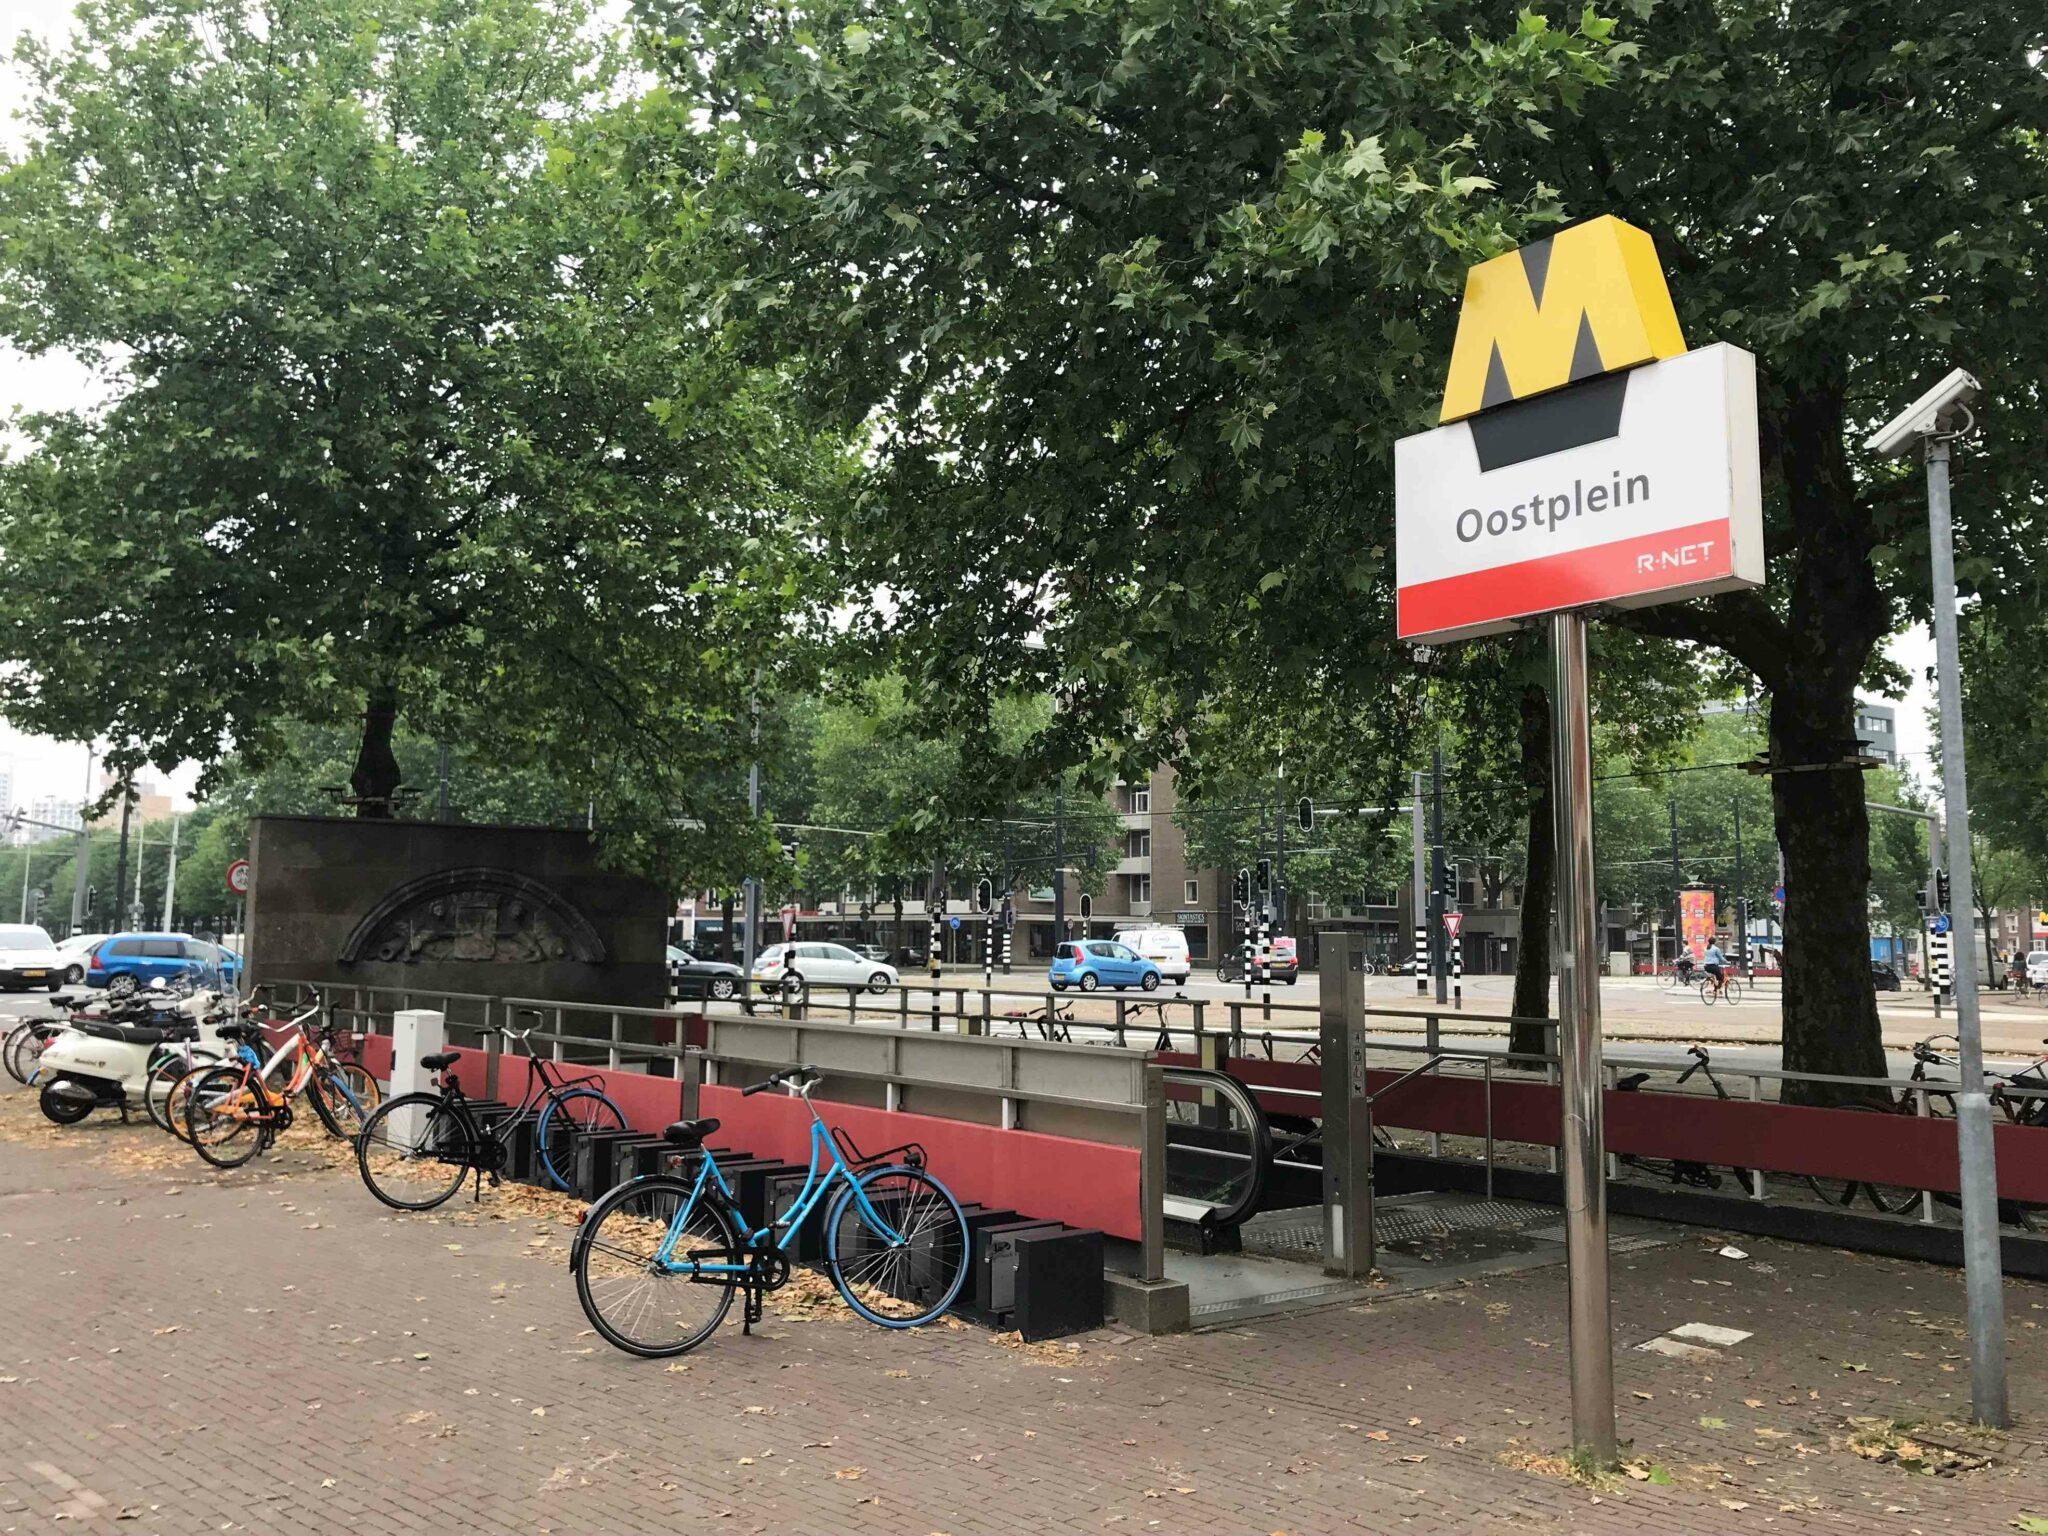 Oostplein